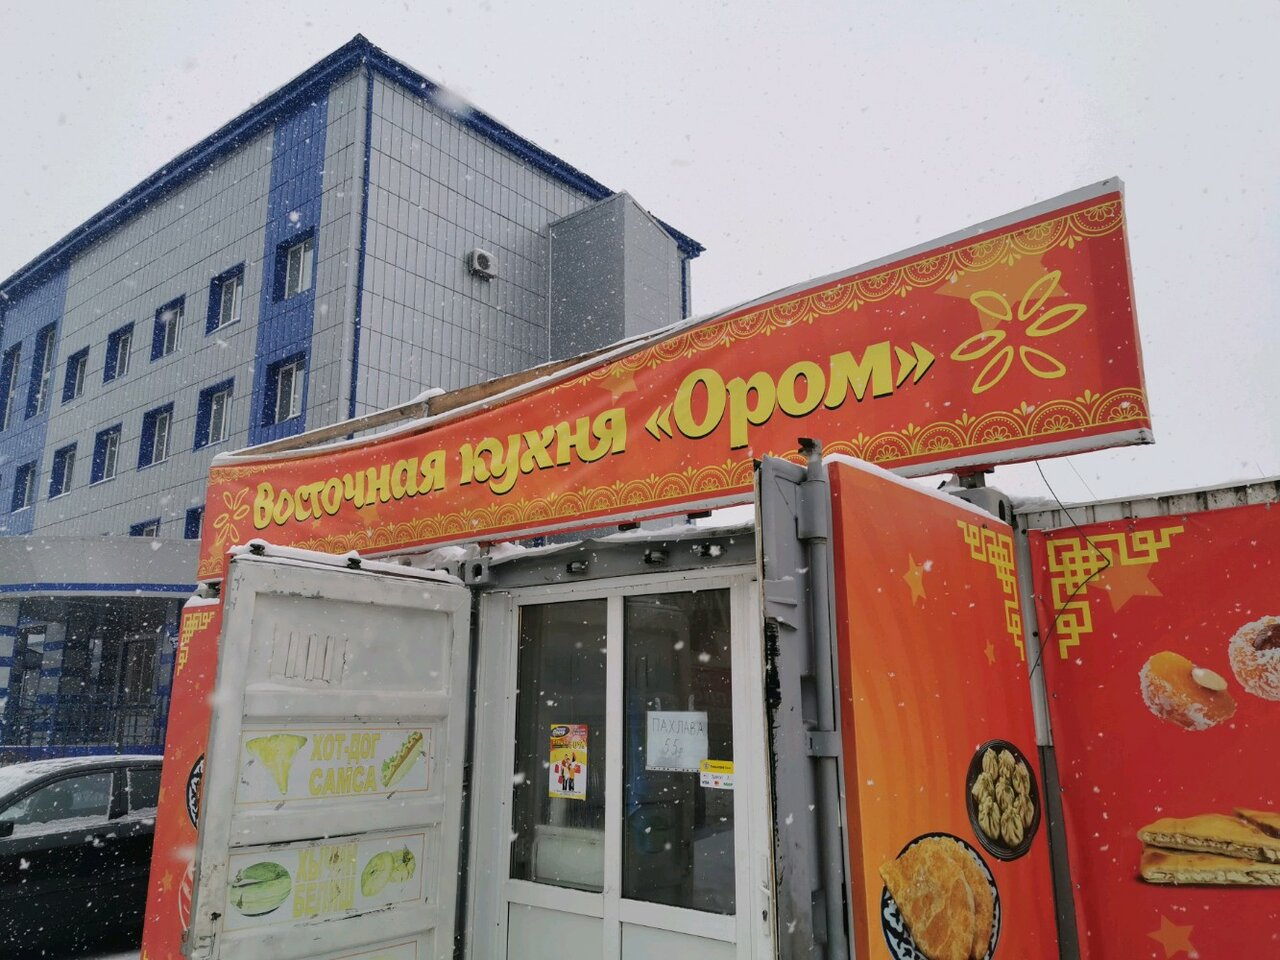 кафе восток фото на иркутском томск оказалось, что